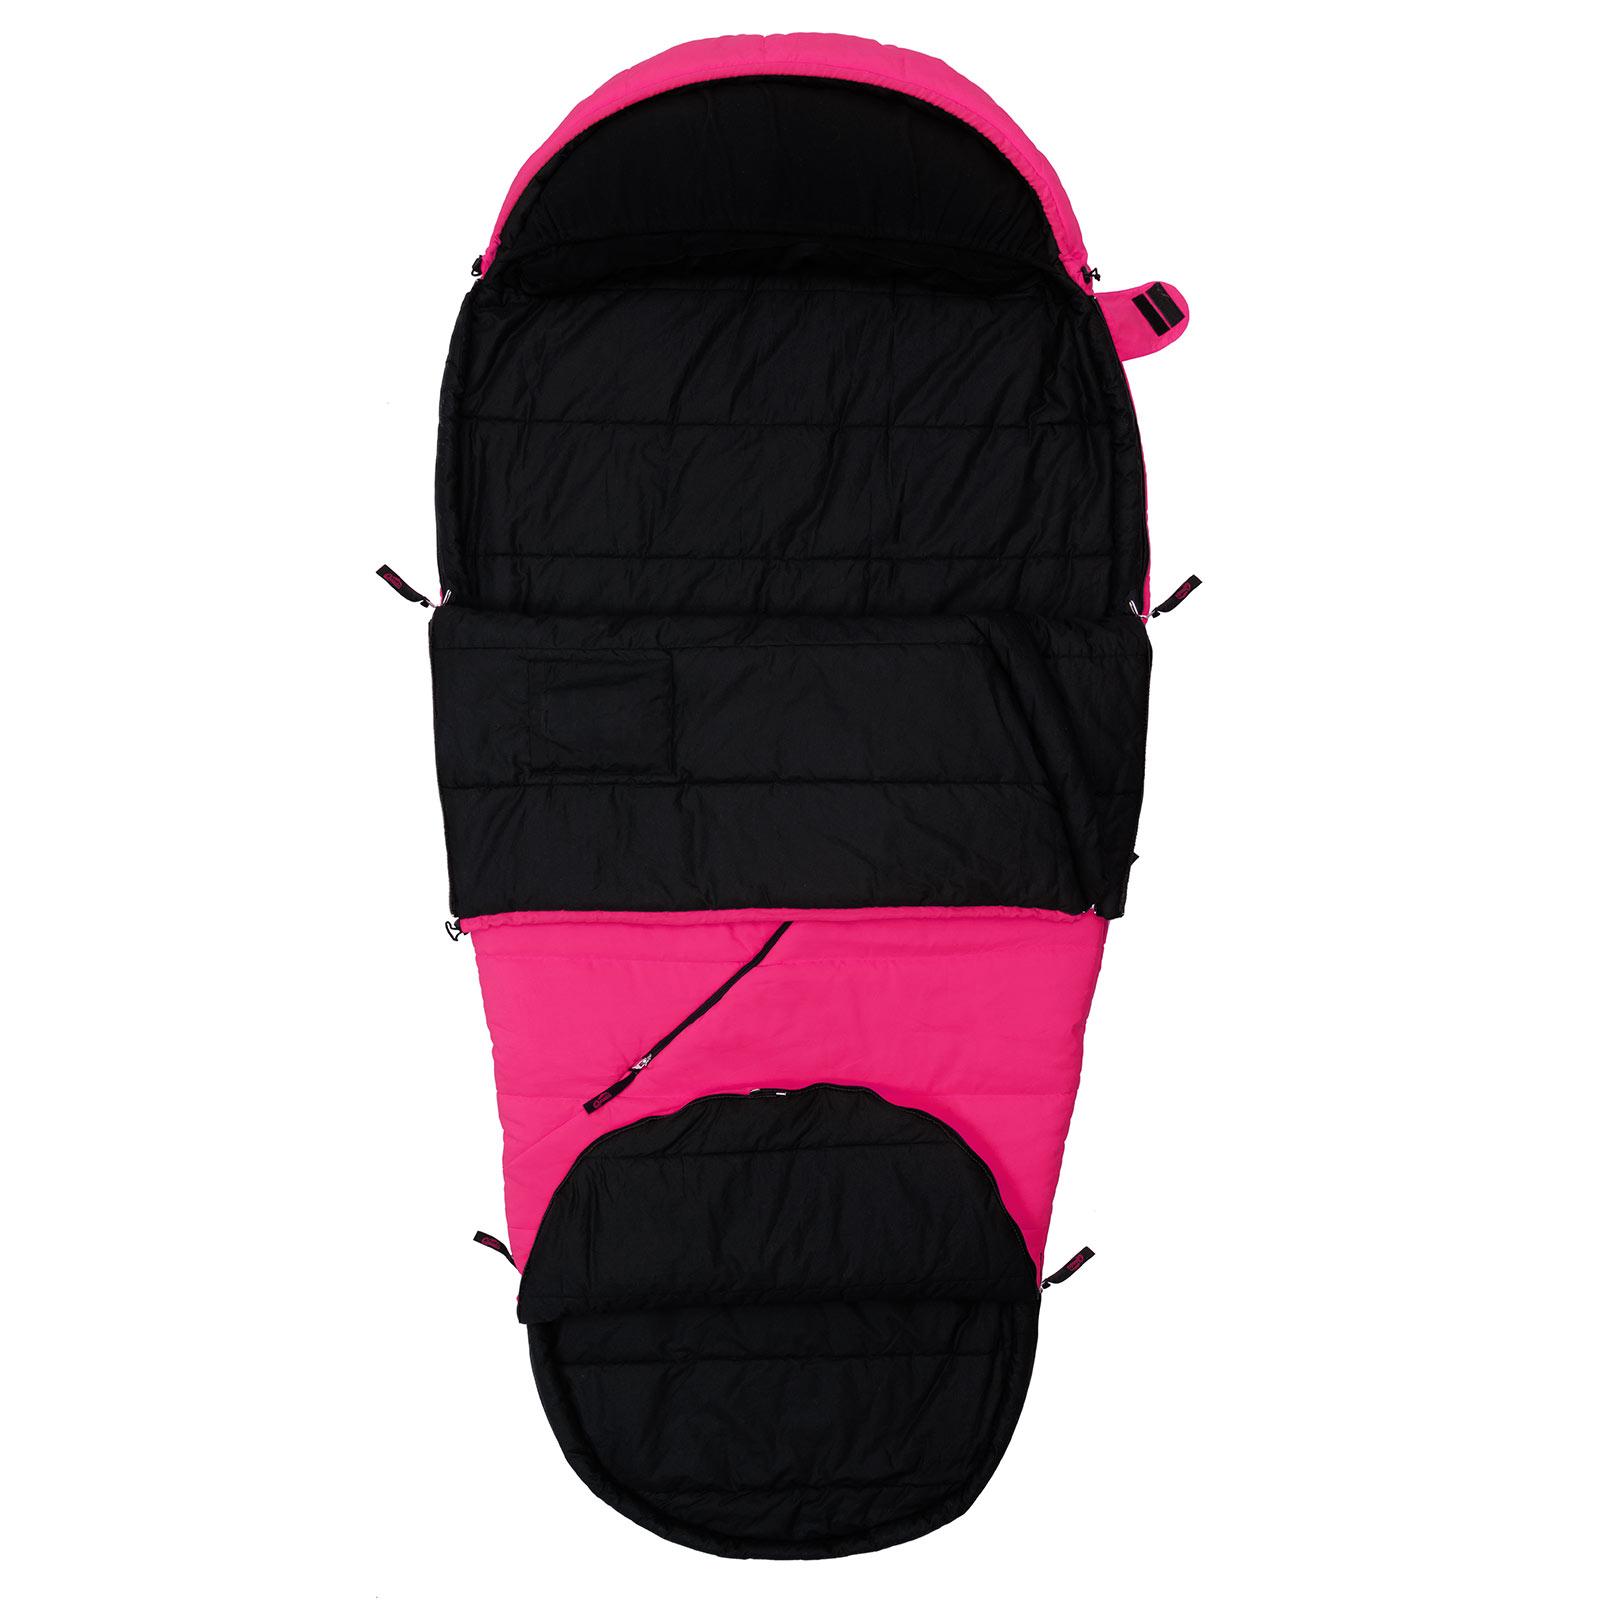 schlafsack pink camping qeedo buddy xl mumienschlafsack. Black Bedroom Furniture Sets. Home Design Ideas